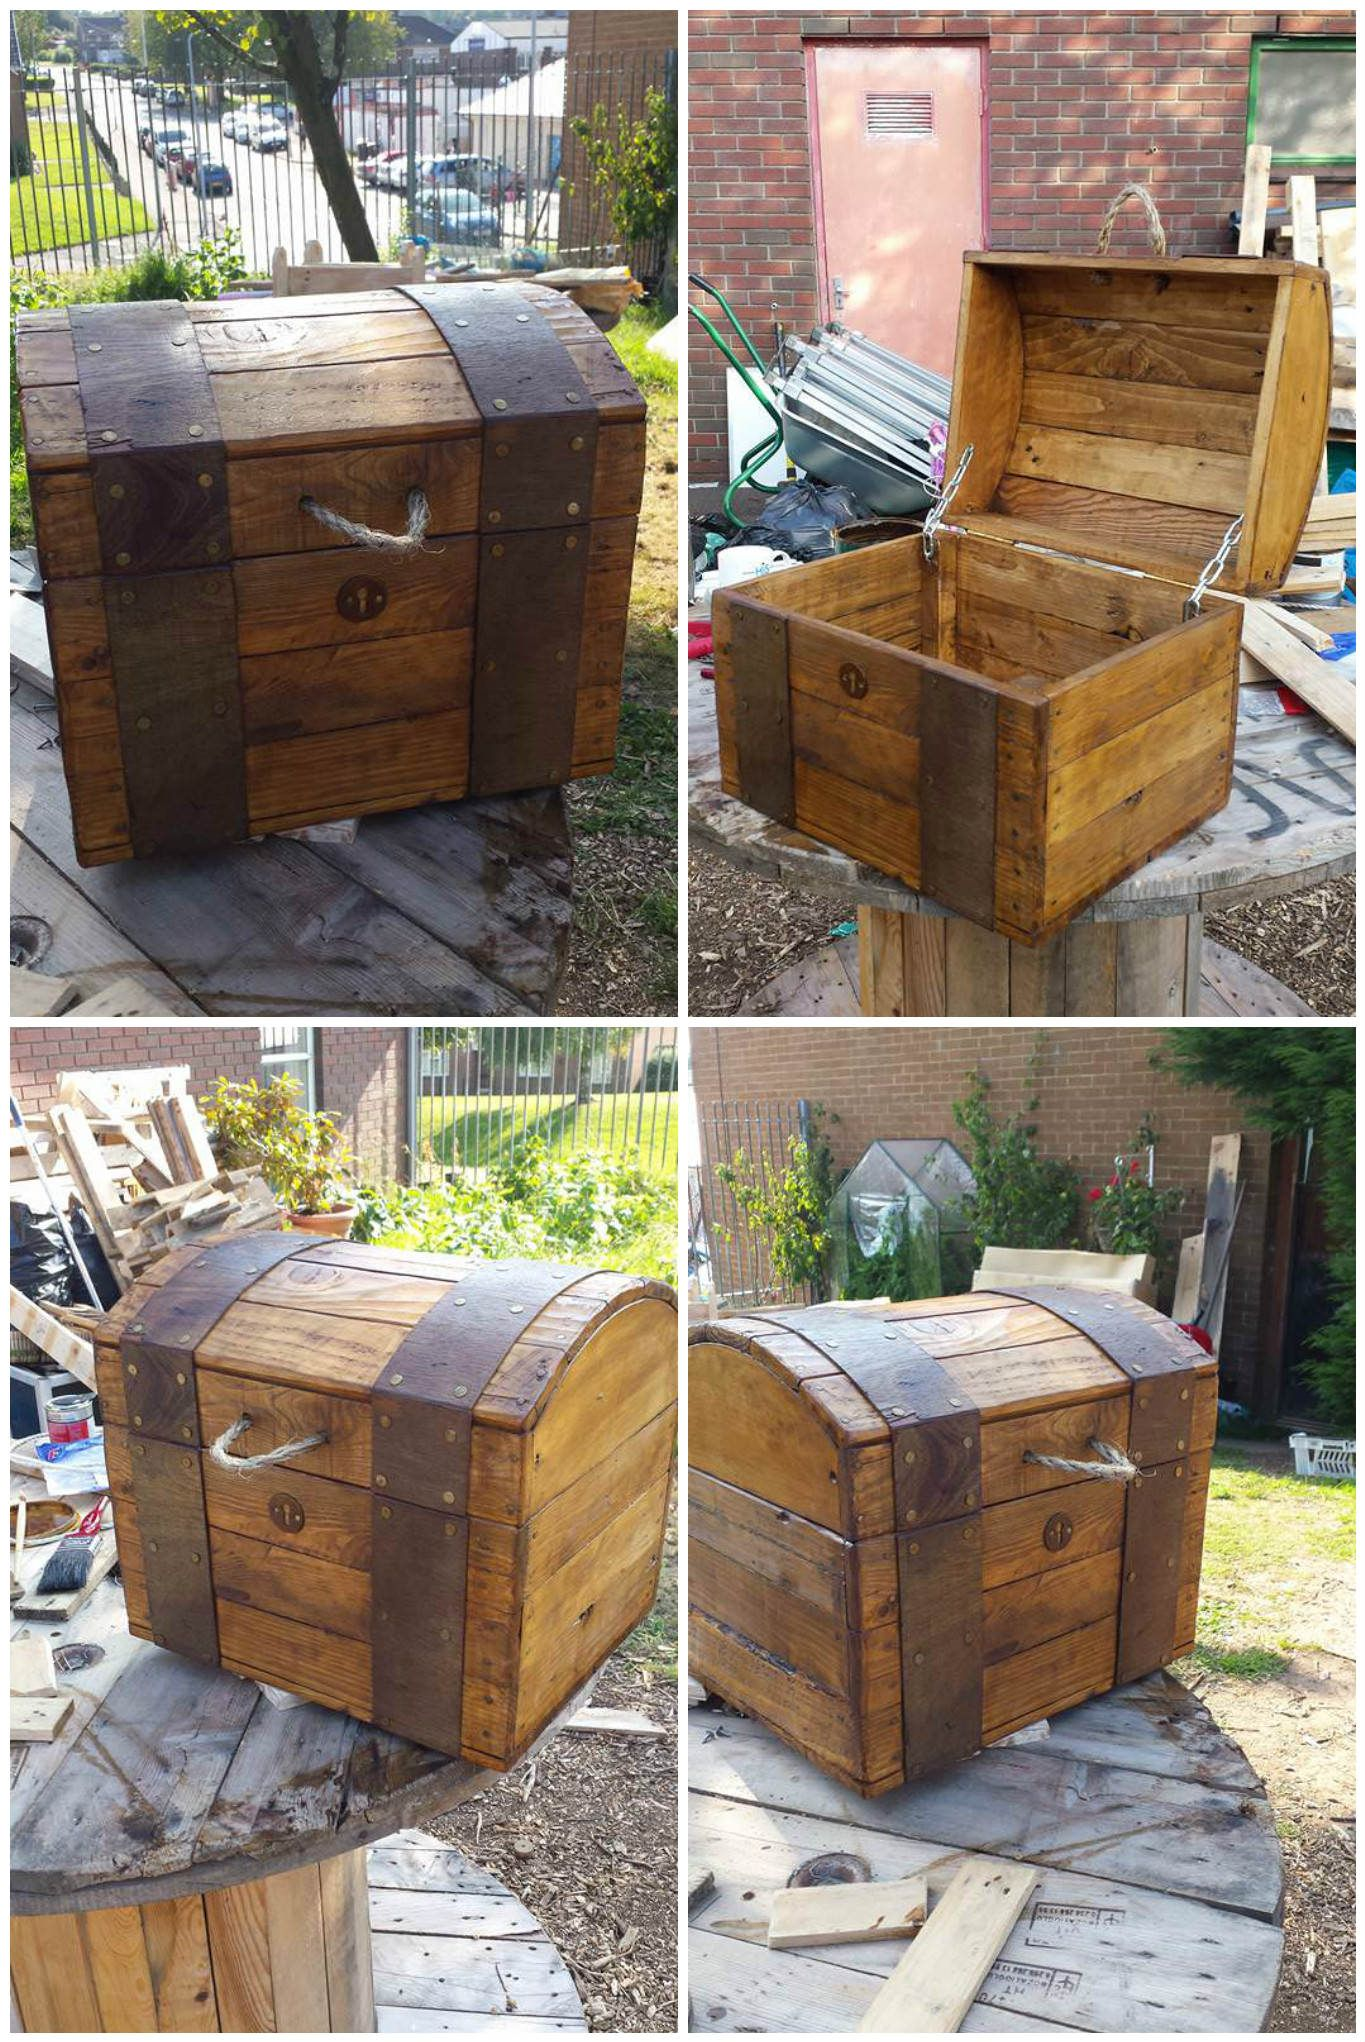 20++ Wood pallet crafts ideas information